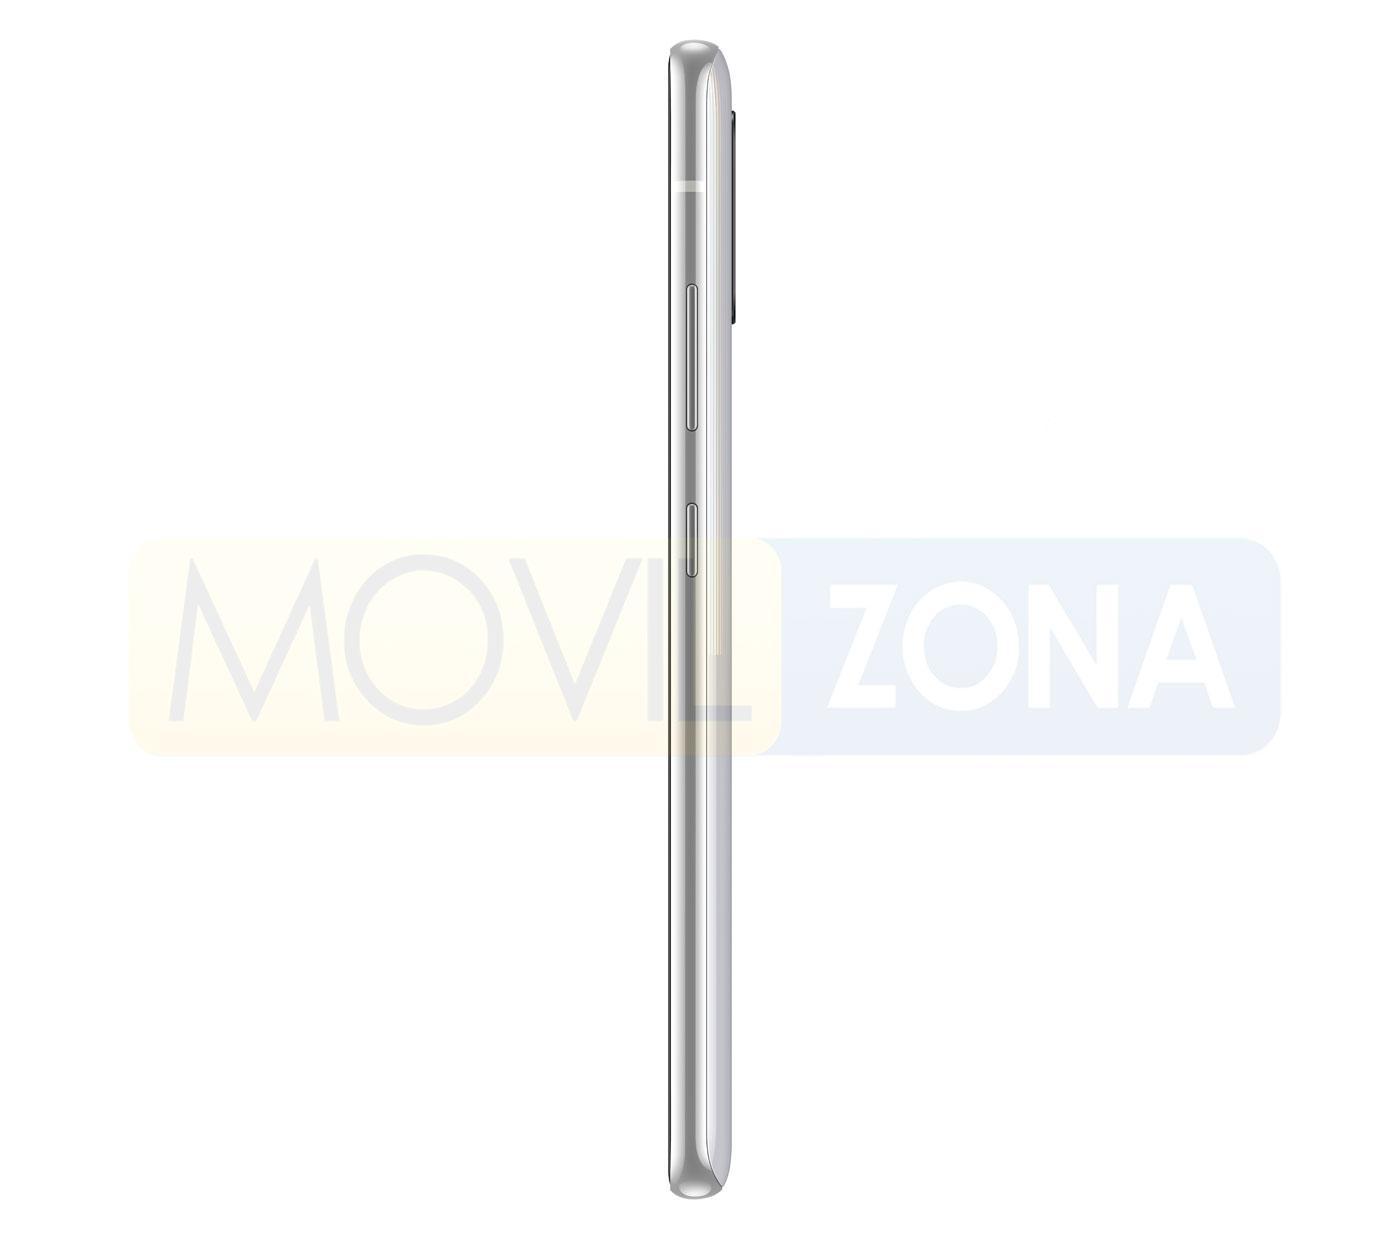 Samsung Galaxy A51 5G perfil